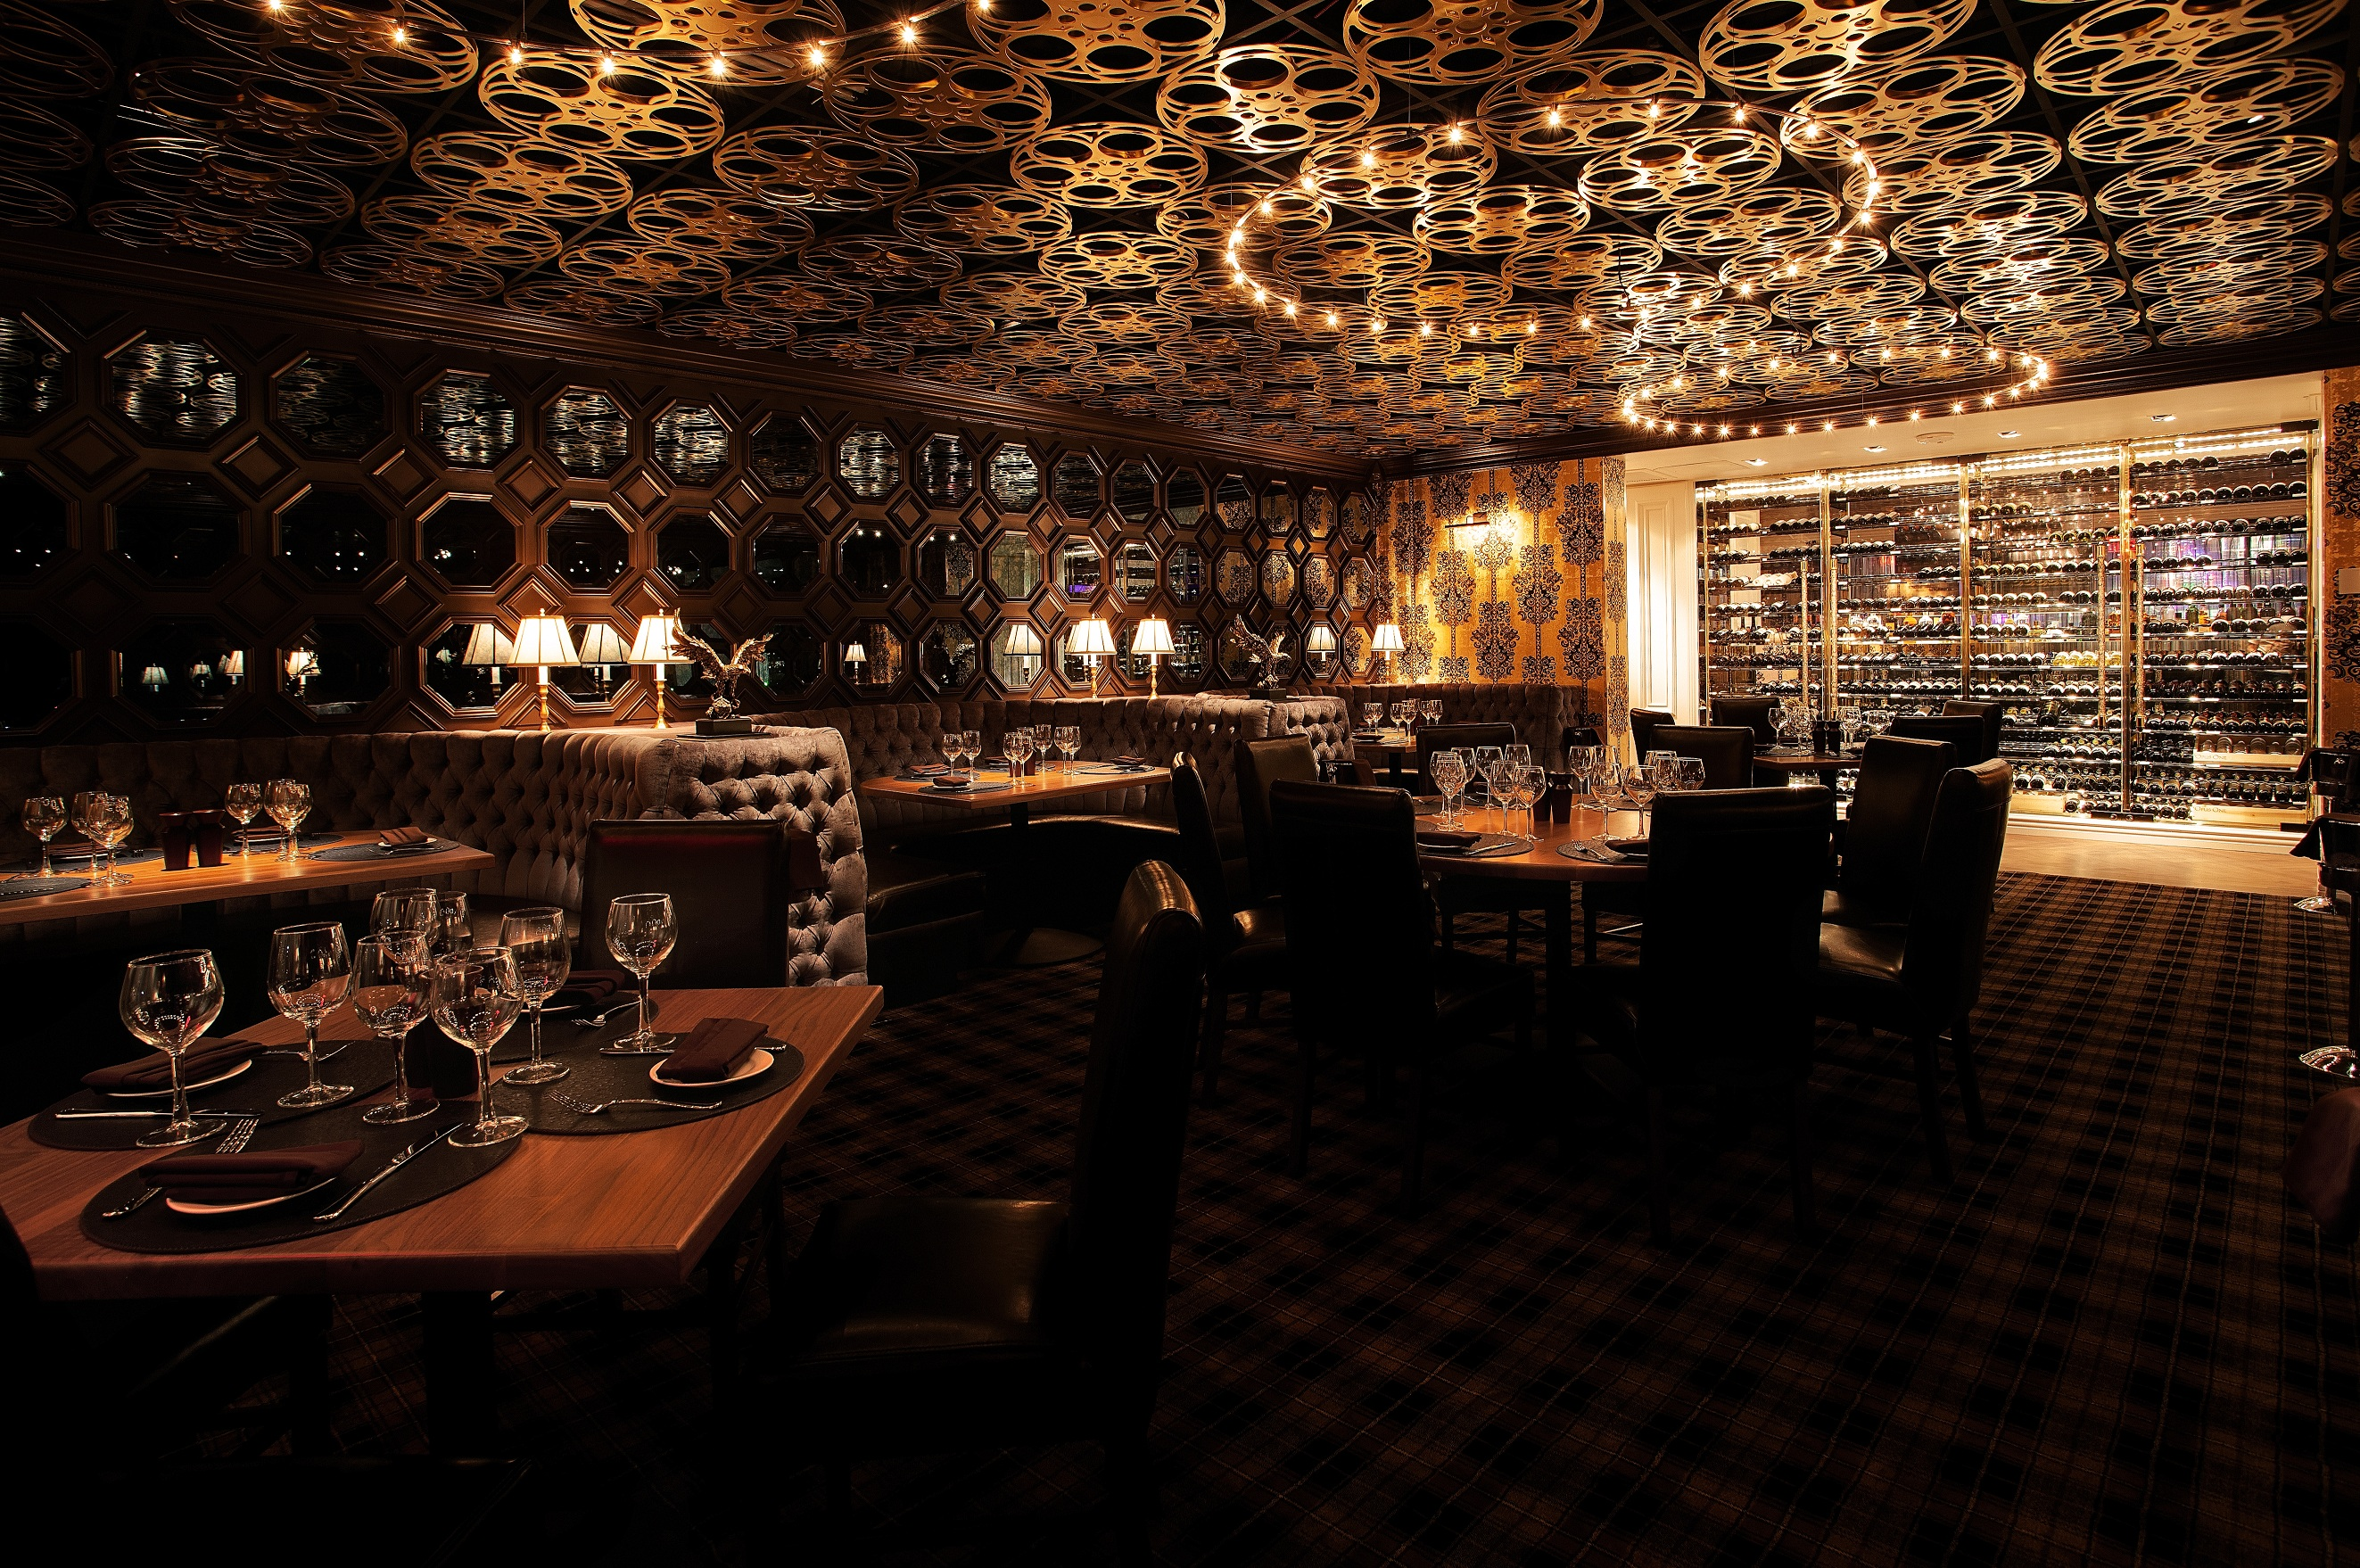 Chandelier Bar Las Vegas at Home and Interior Design Ideas